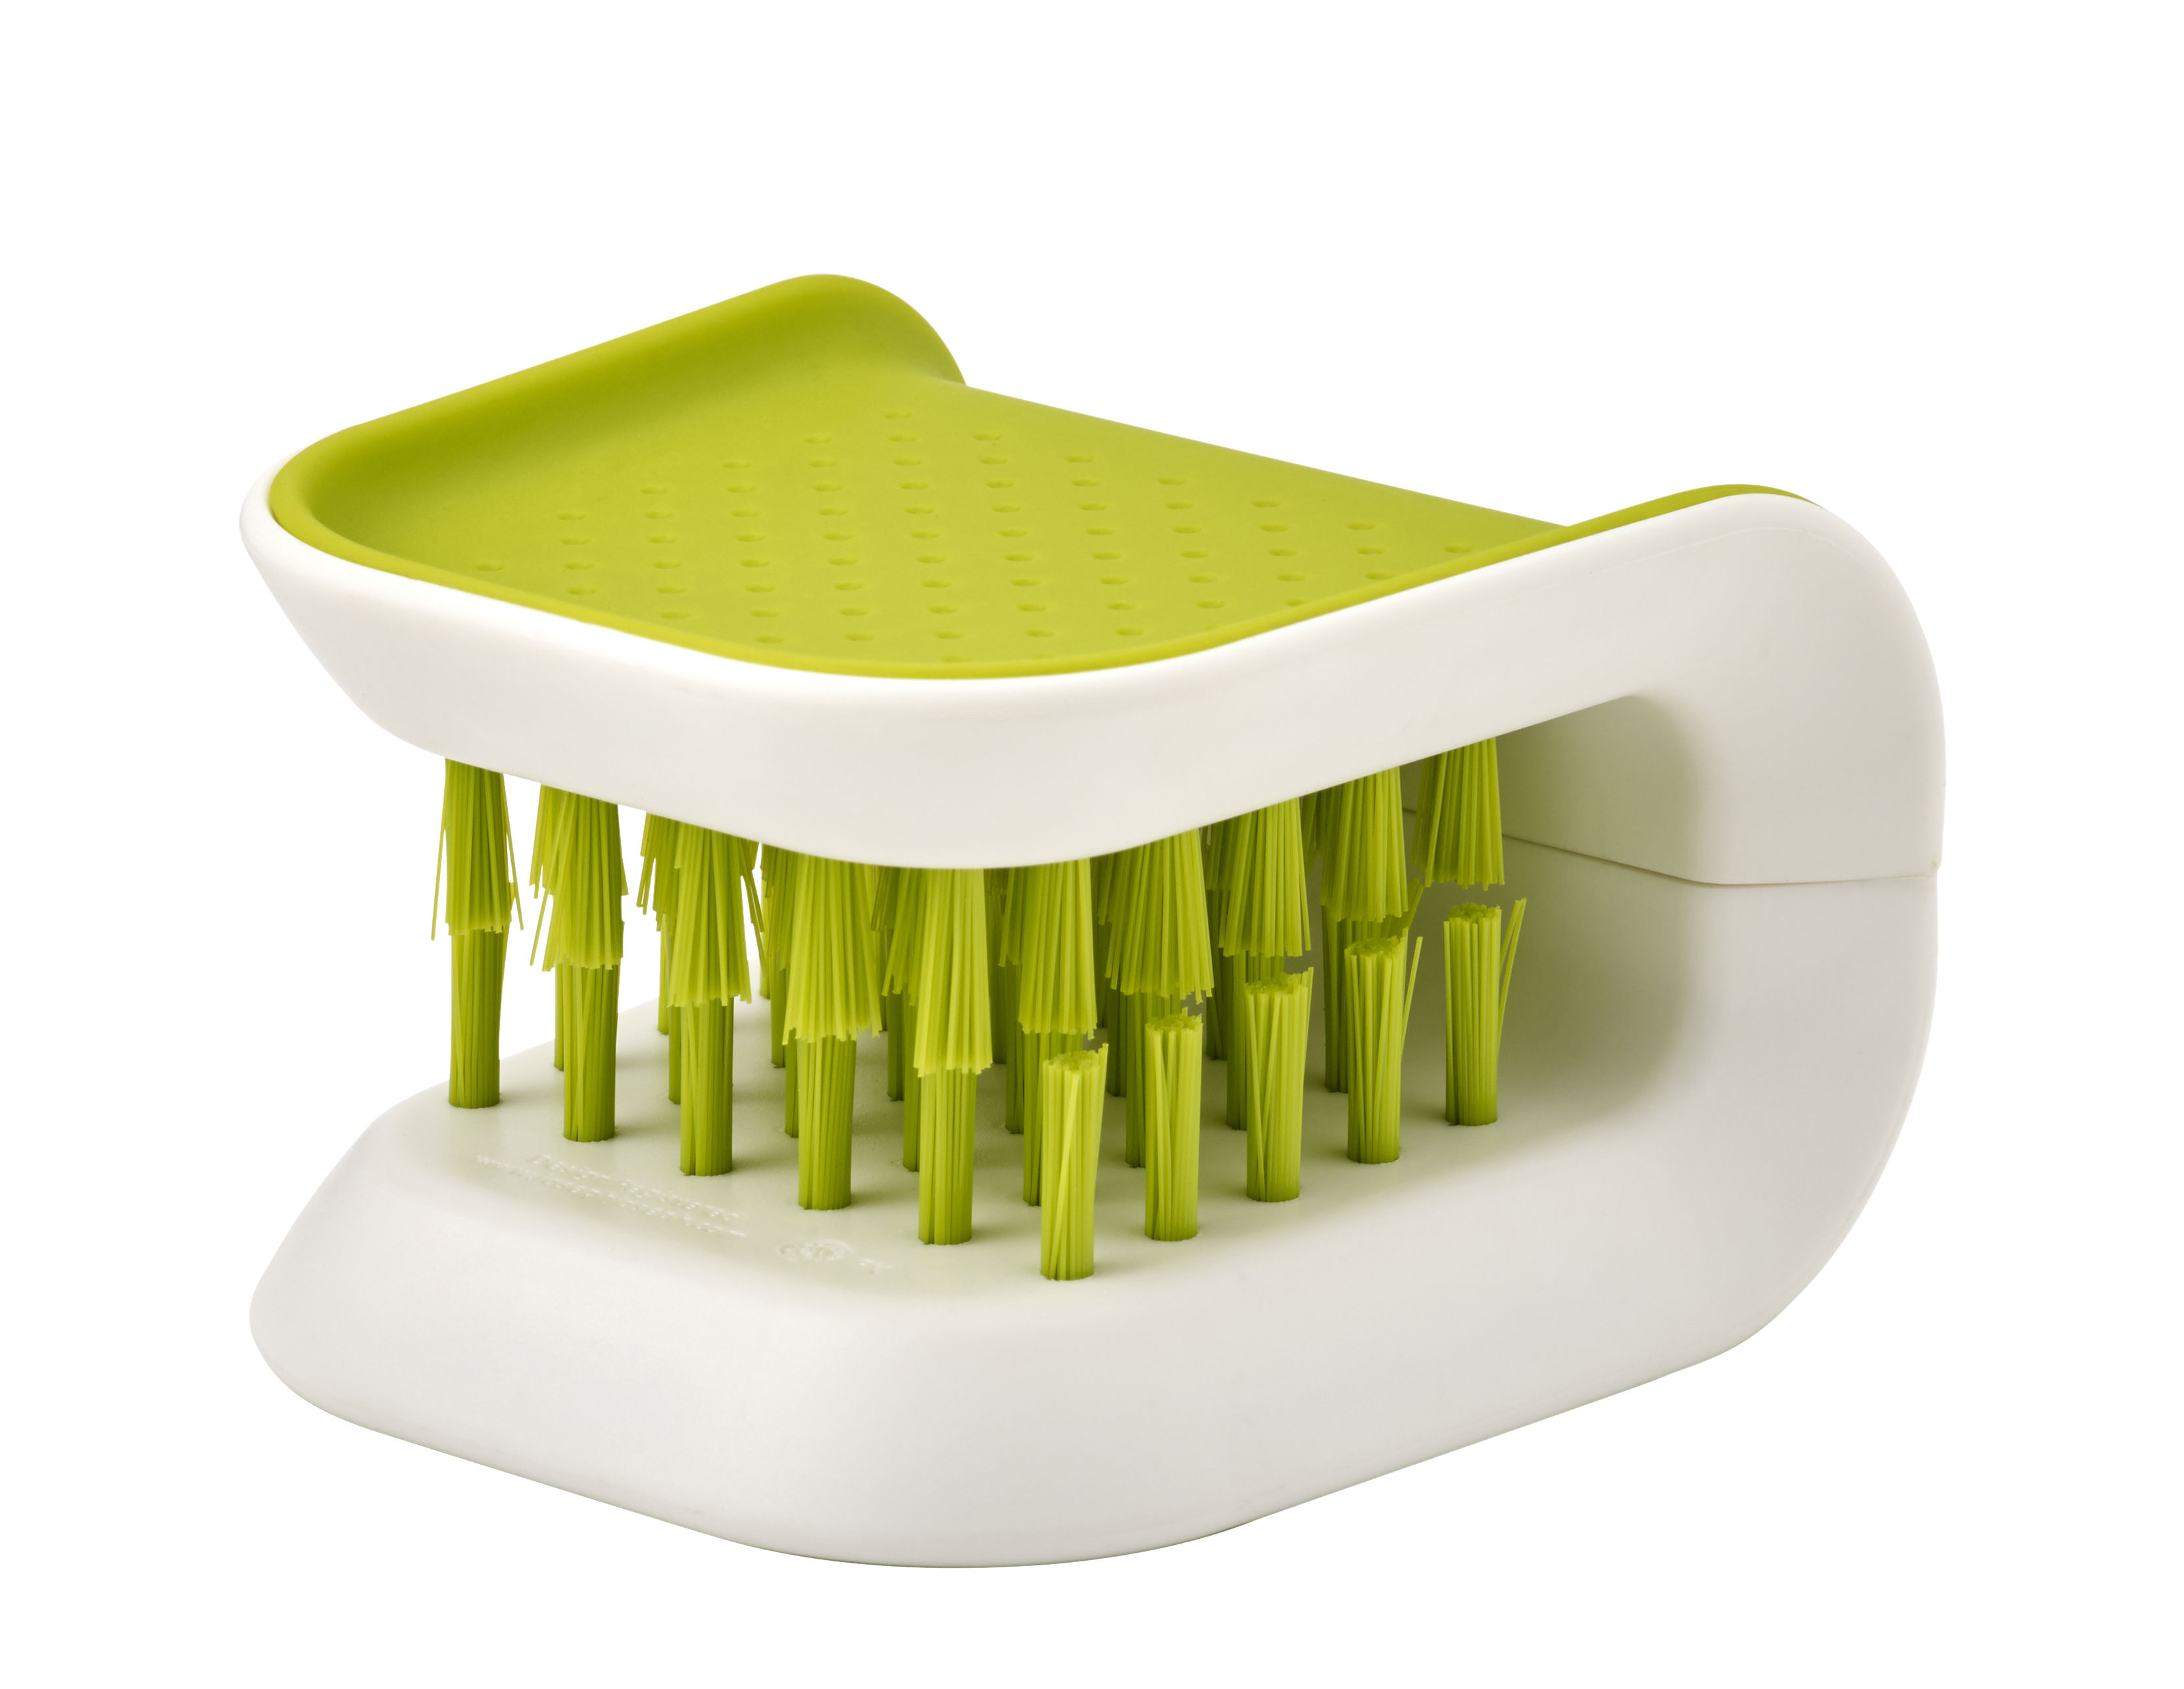 Cuisine - Vaisselle et nettoyage - Brosse à couverts BladeBrush - Joseph Joseph - Vert - ABS, Nylon